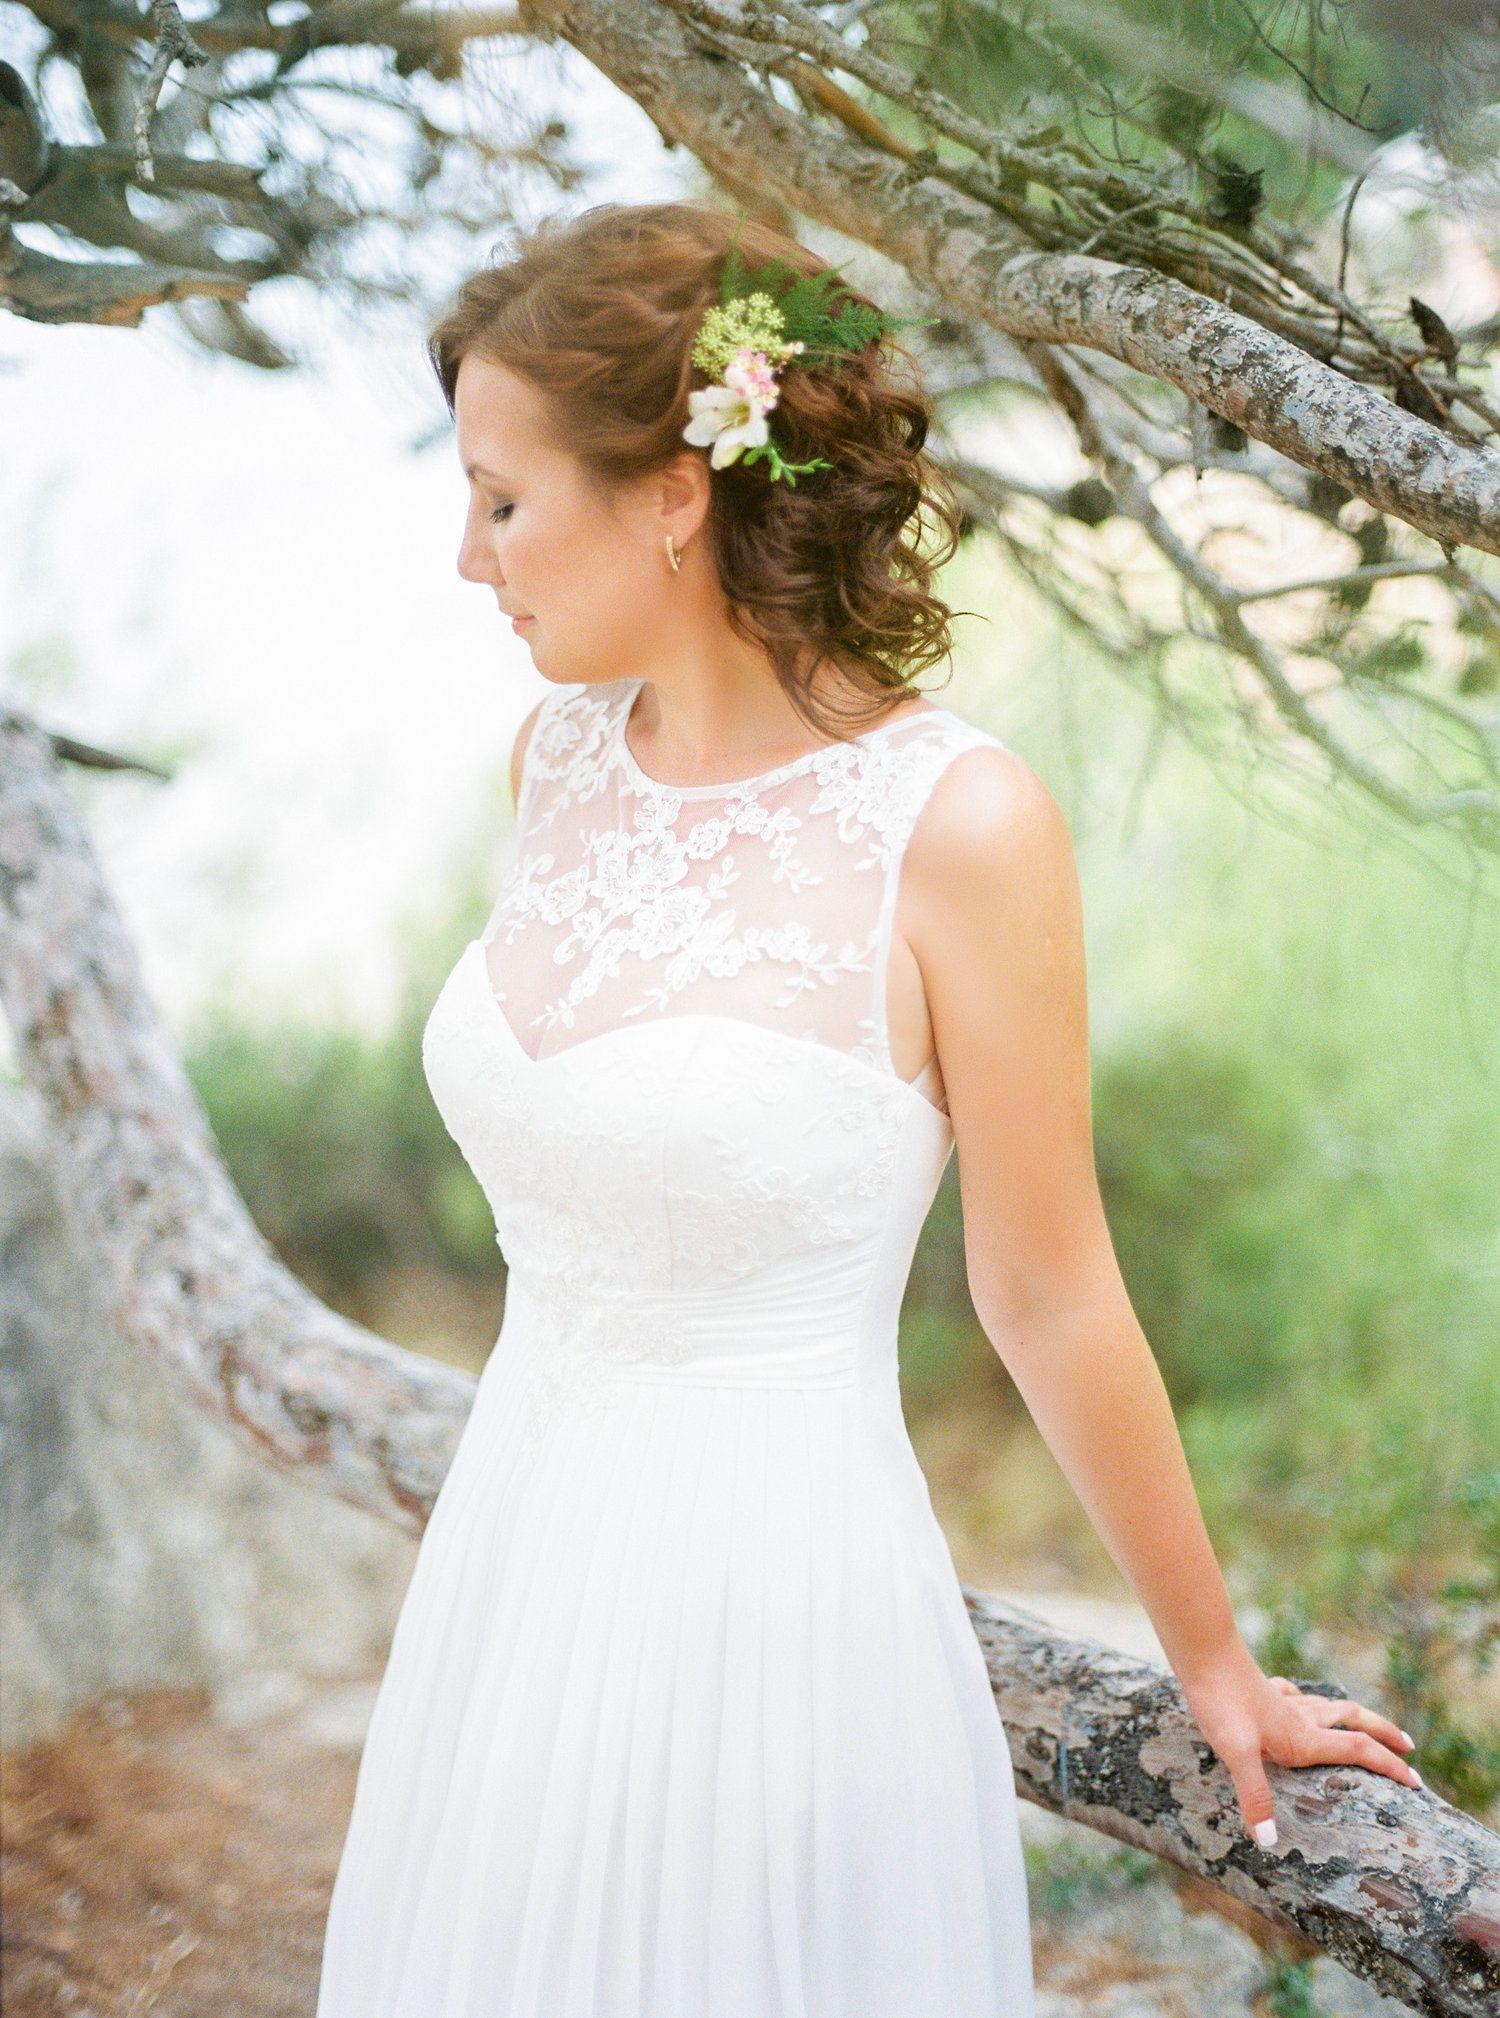 A Costa Dorada Honeymoon Beach Session | Salou spain, Wedding and ...